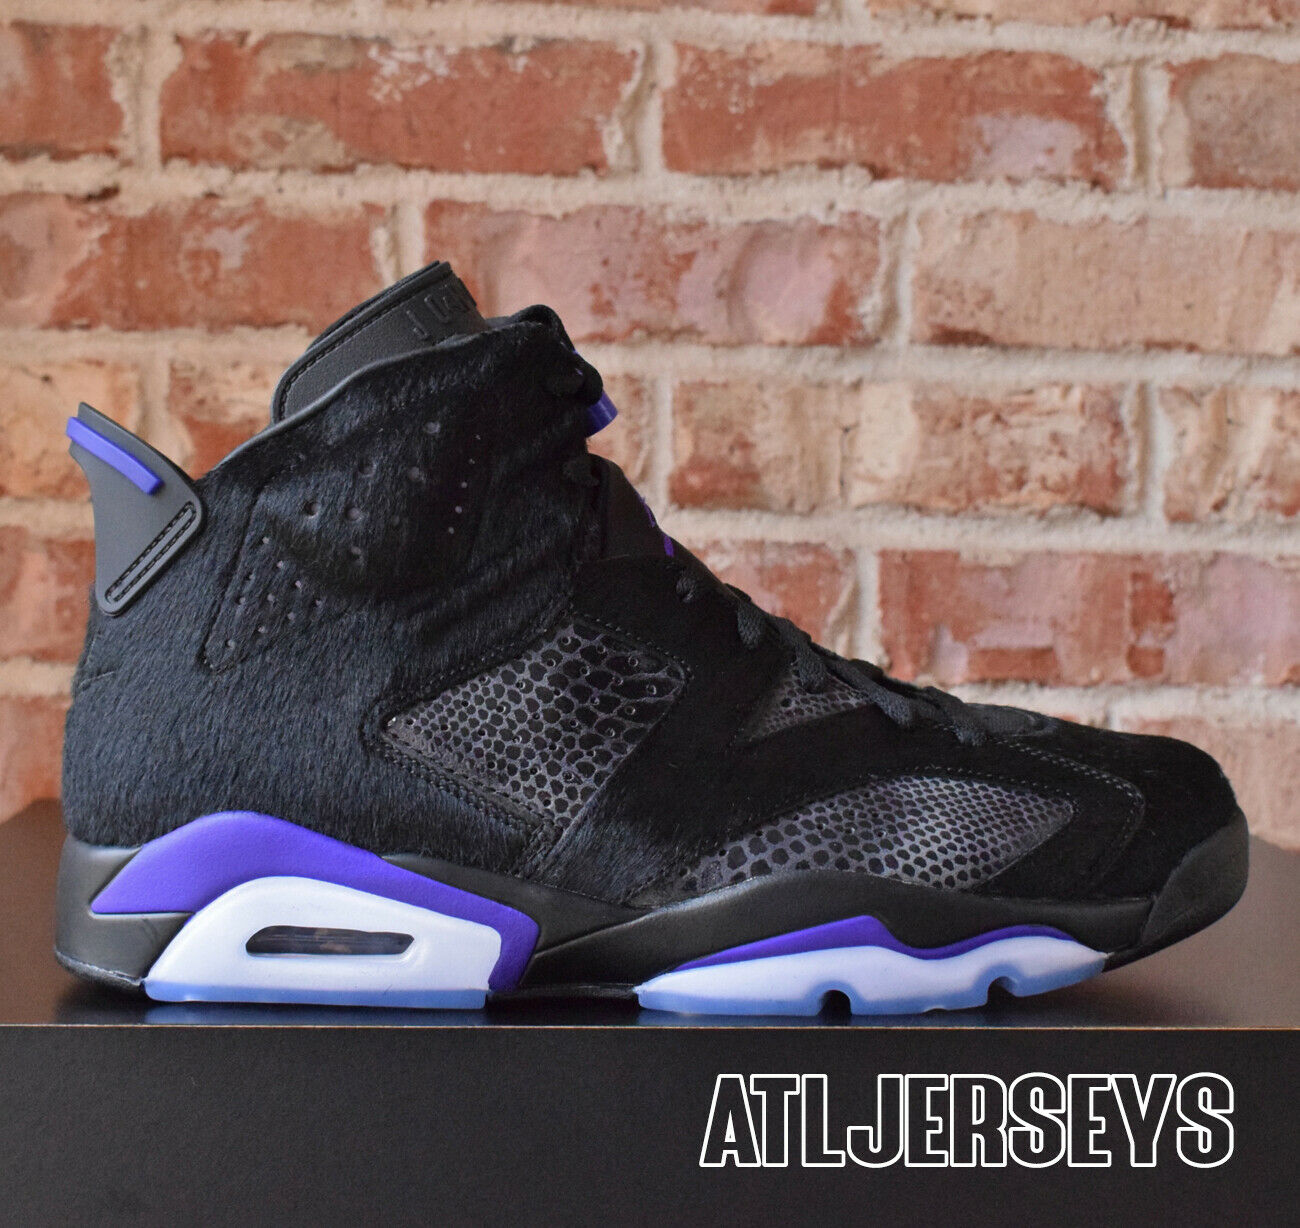 Social Status x Nike Air Jordan 6 VI Retro Black Concord AR2257-005 Size